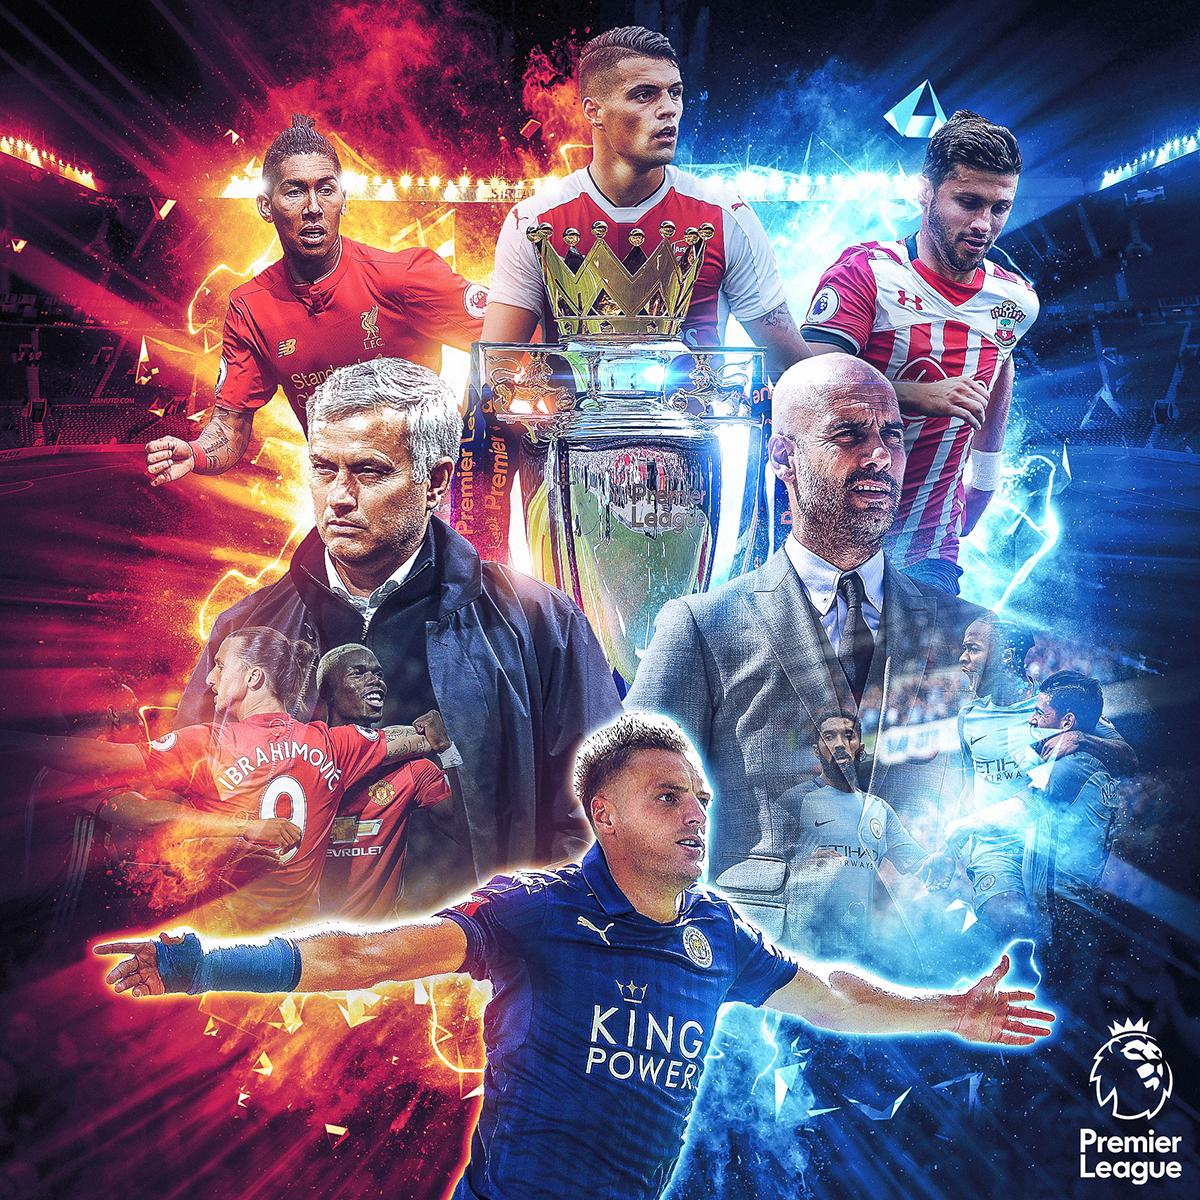 Premier league official social media artwork 1 on behance for Art premier